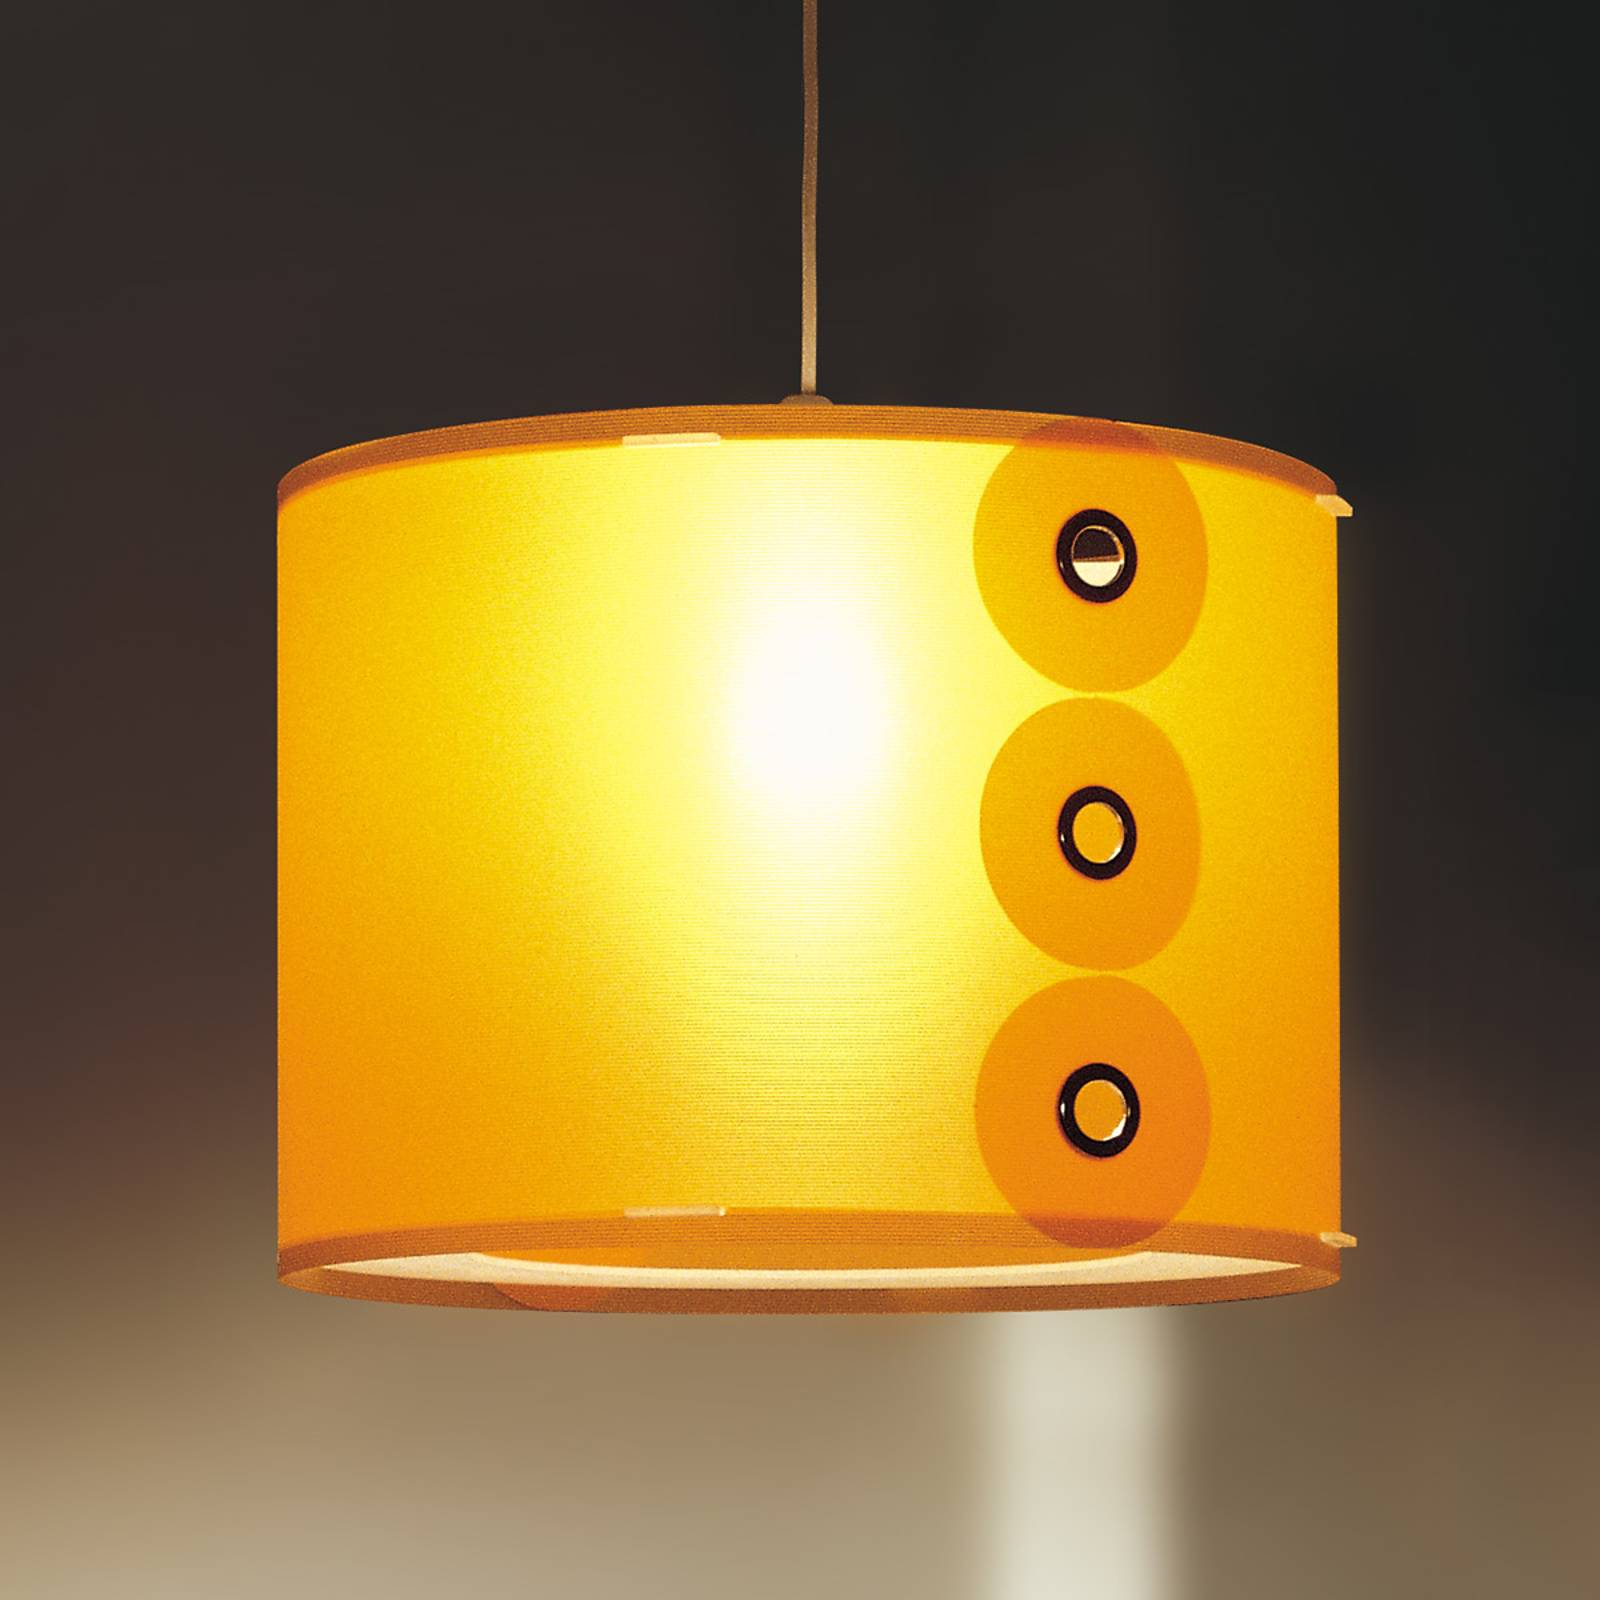 Oranje gekleurde hanglamp Rotho